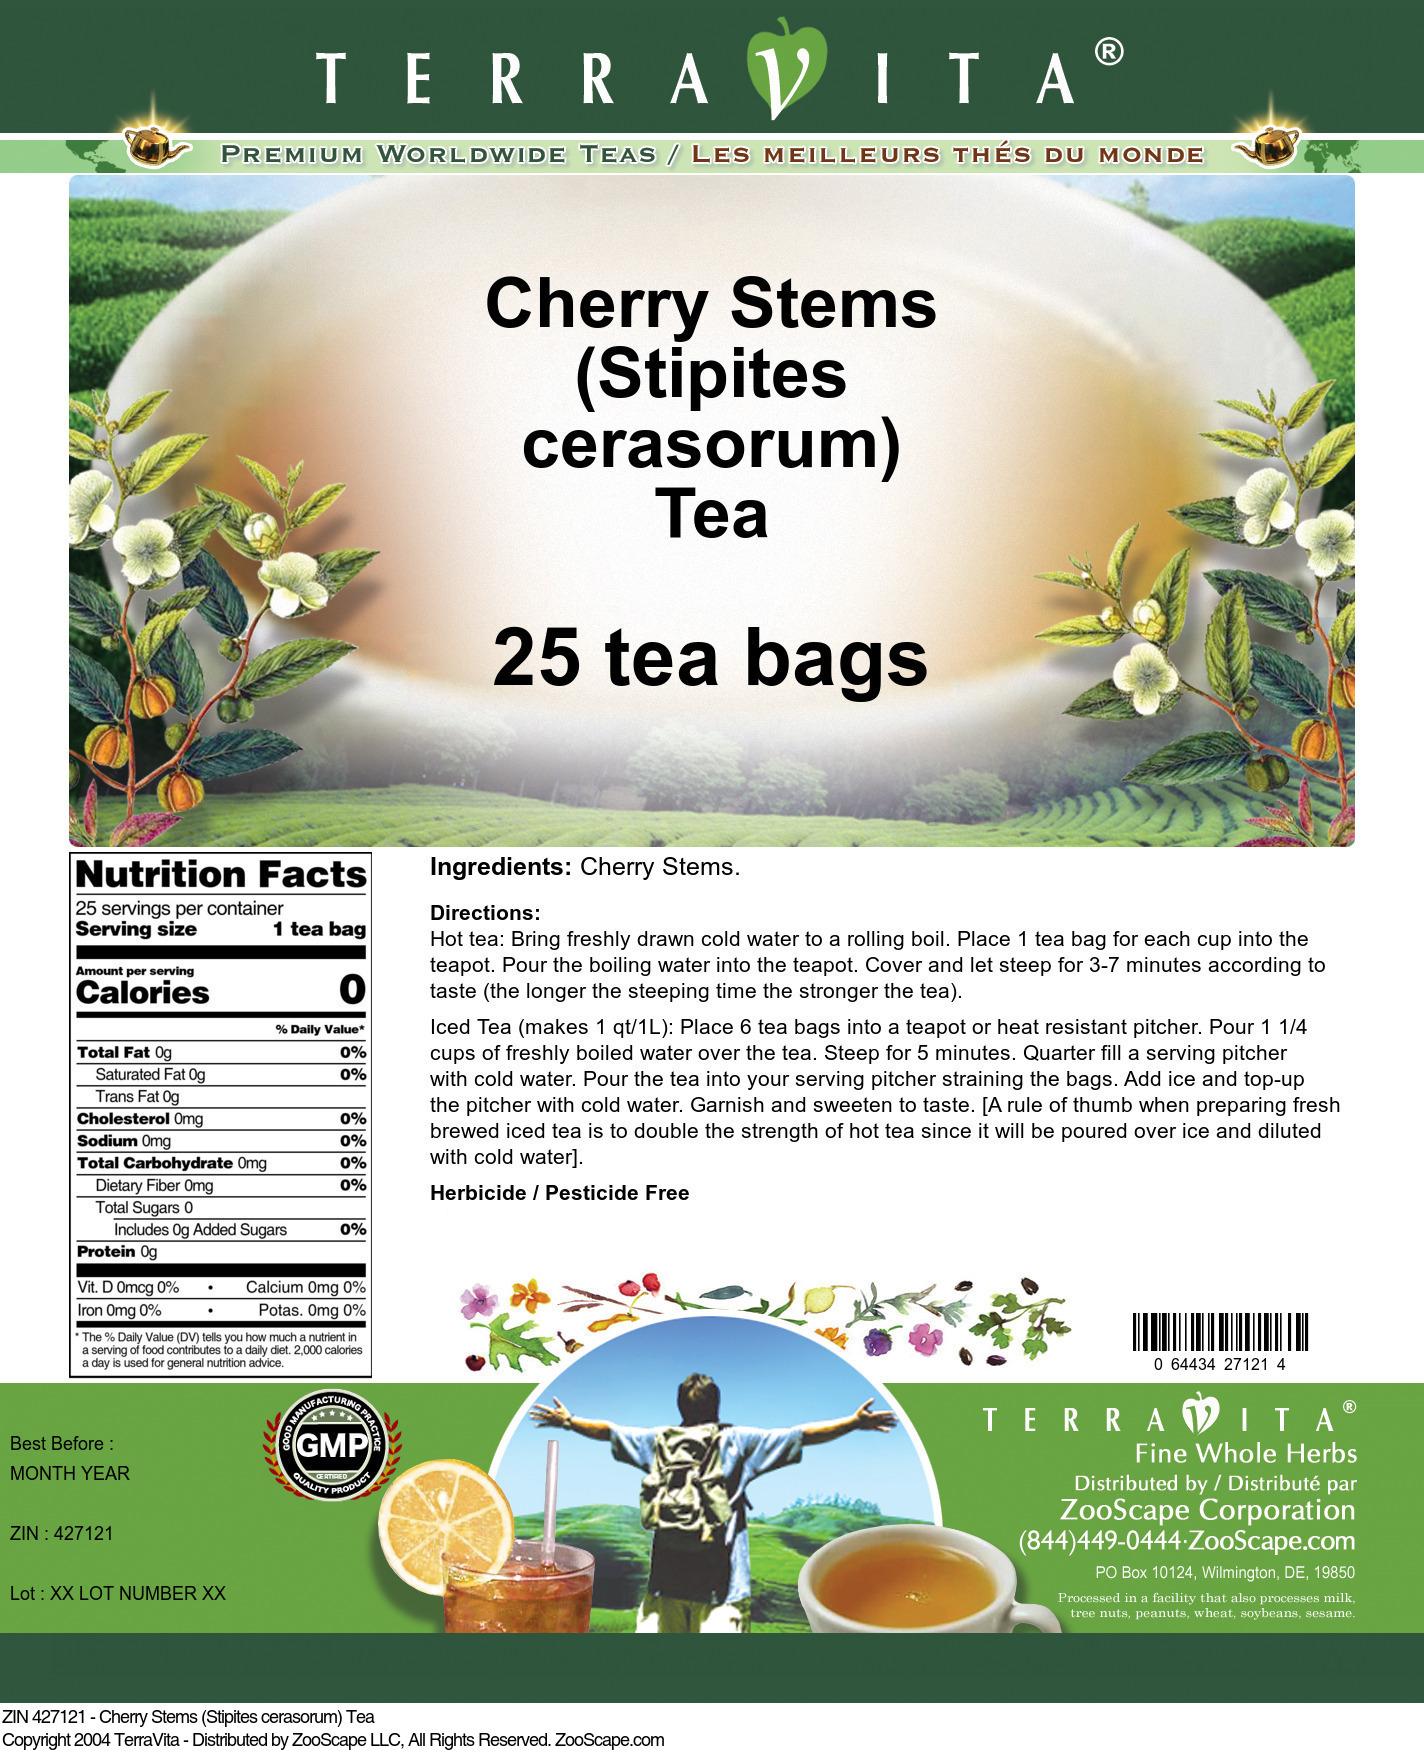 Cherry Stems (Stipites cerasorum) Tea